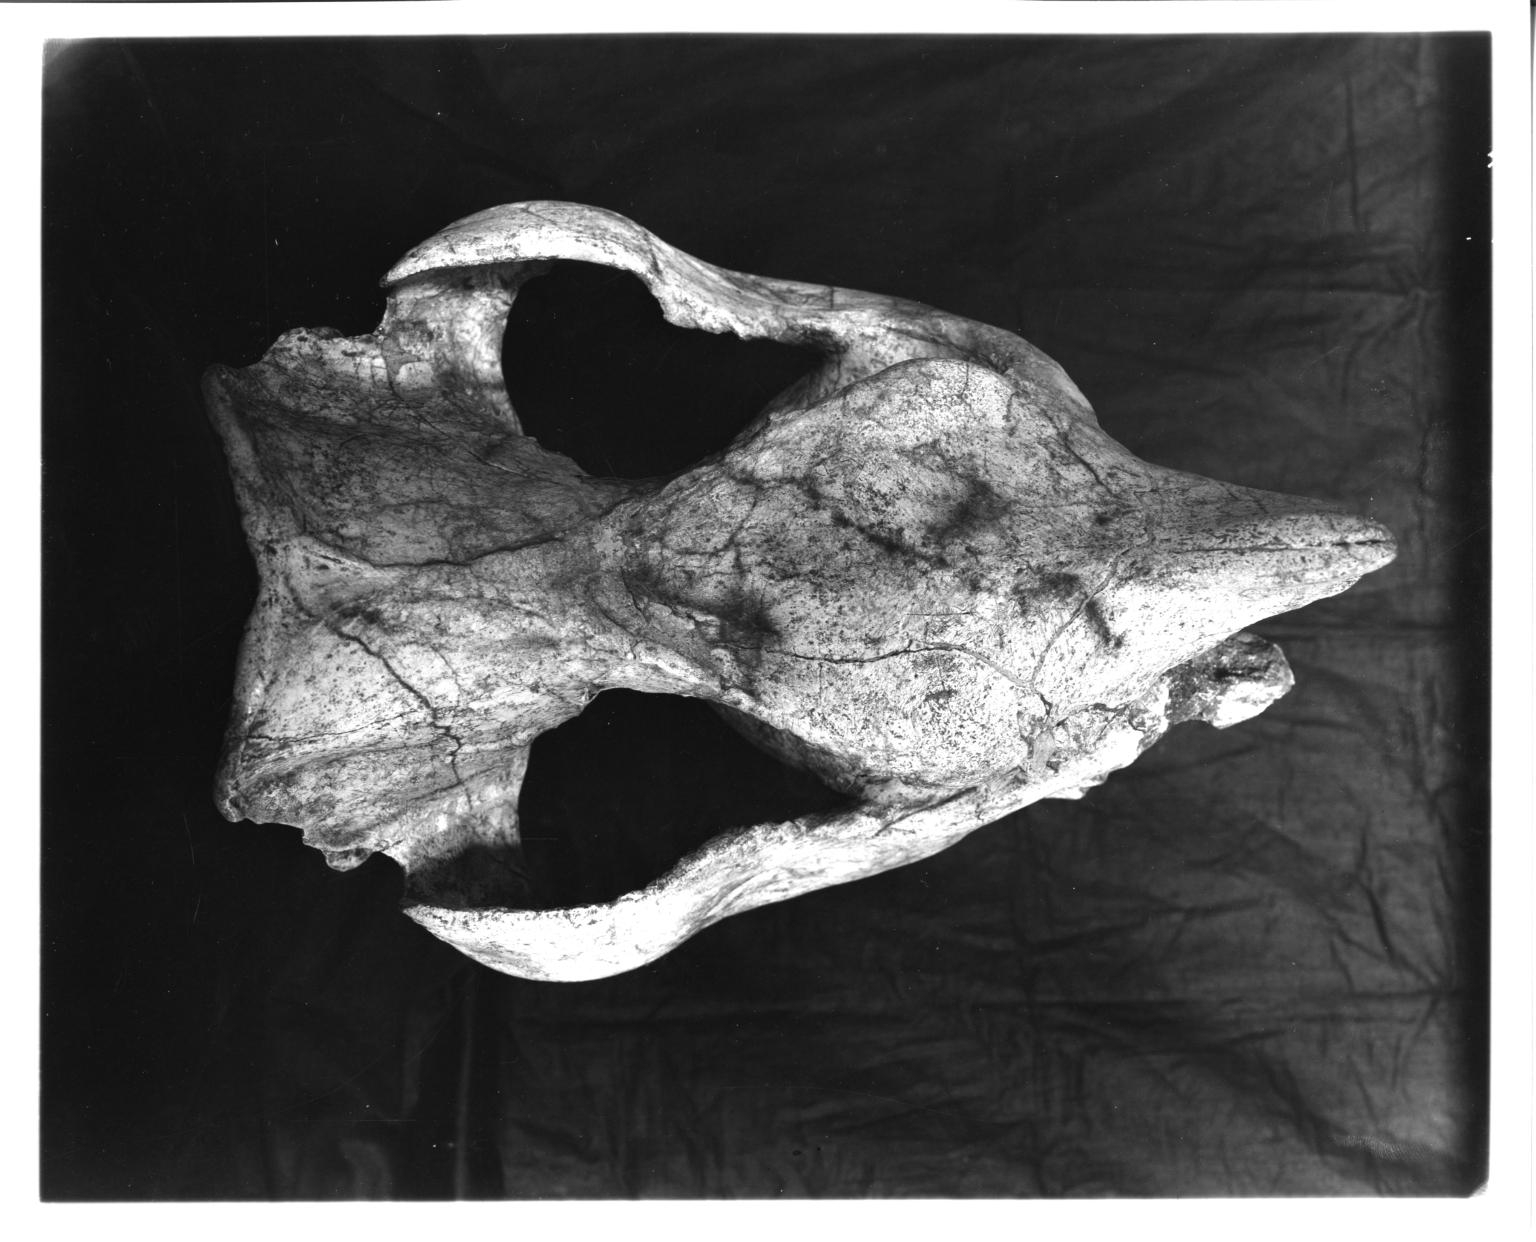 Teleoceras hicksi skull